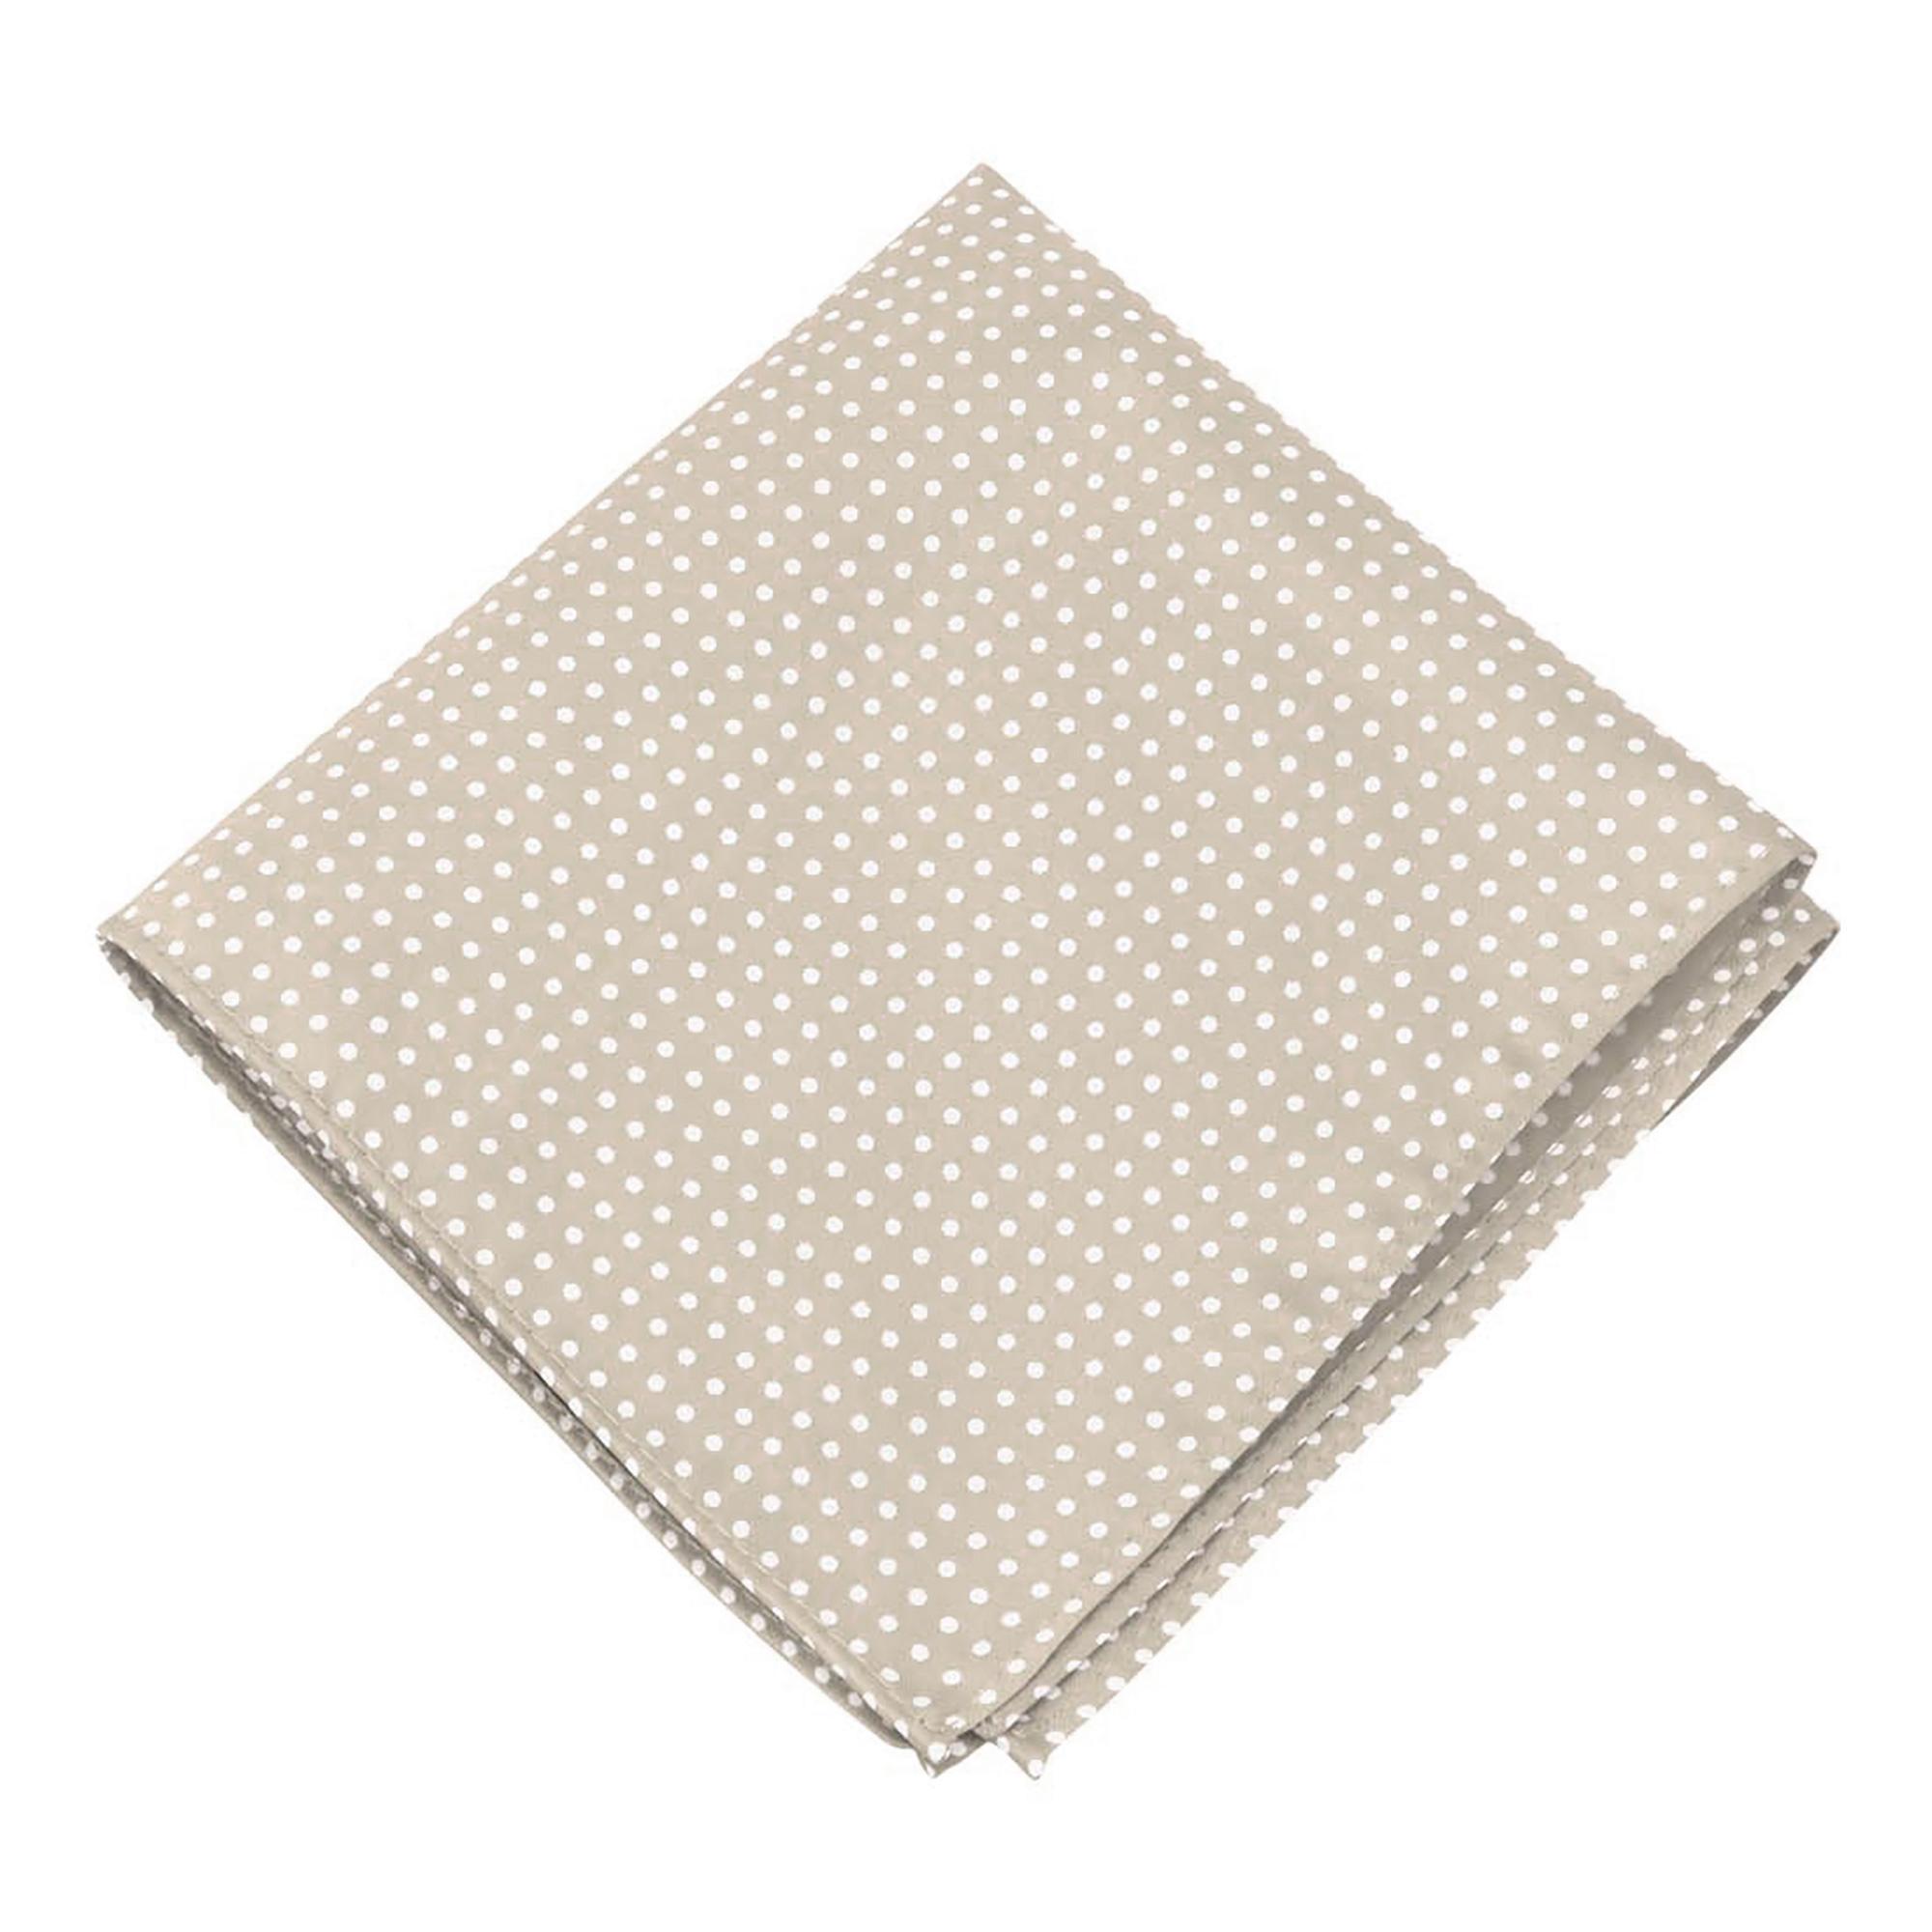 Jacob-Alexander-Matching-Polka-Dot-Suspenders-Handkerchief-and-Bow-Tie thumbnail 40